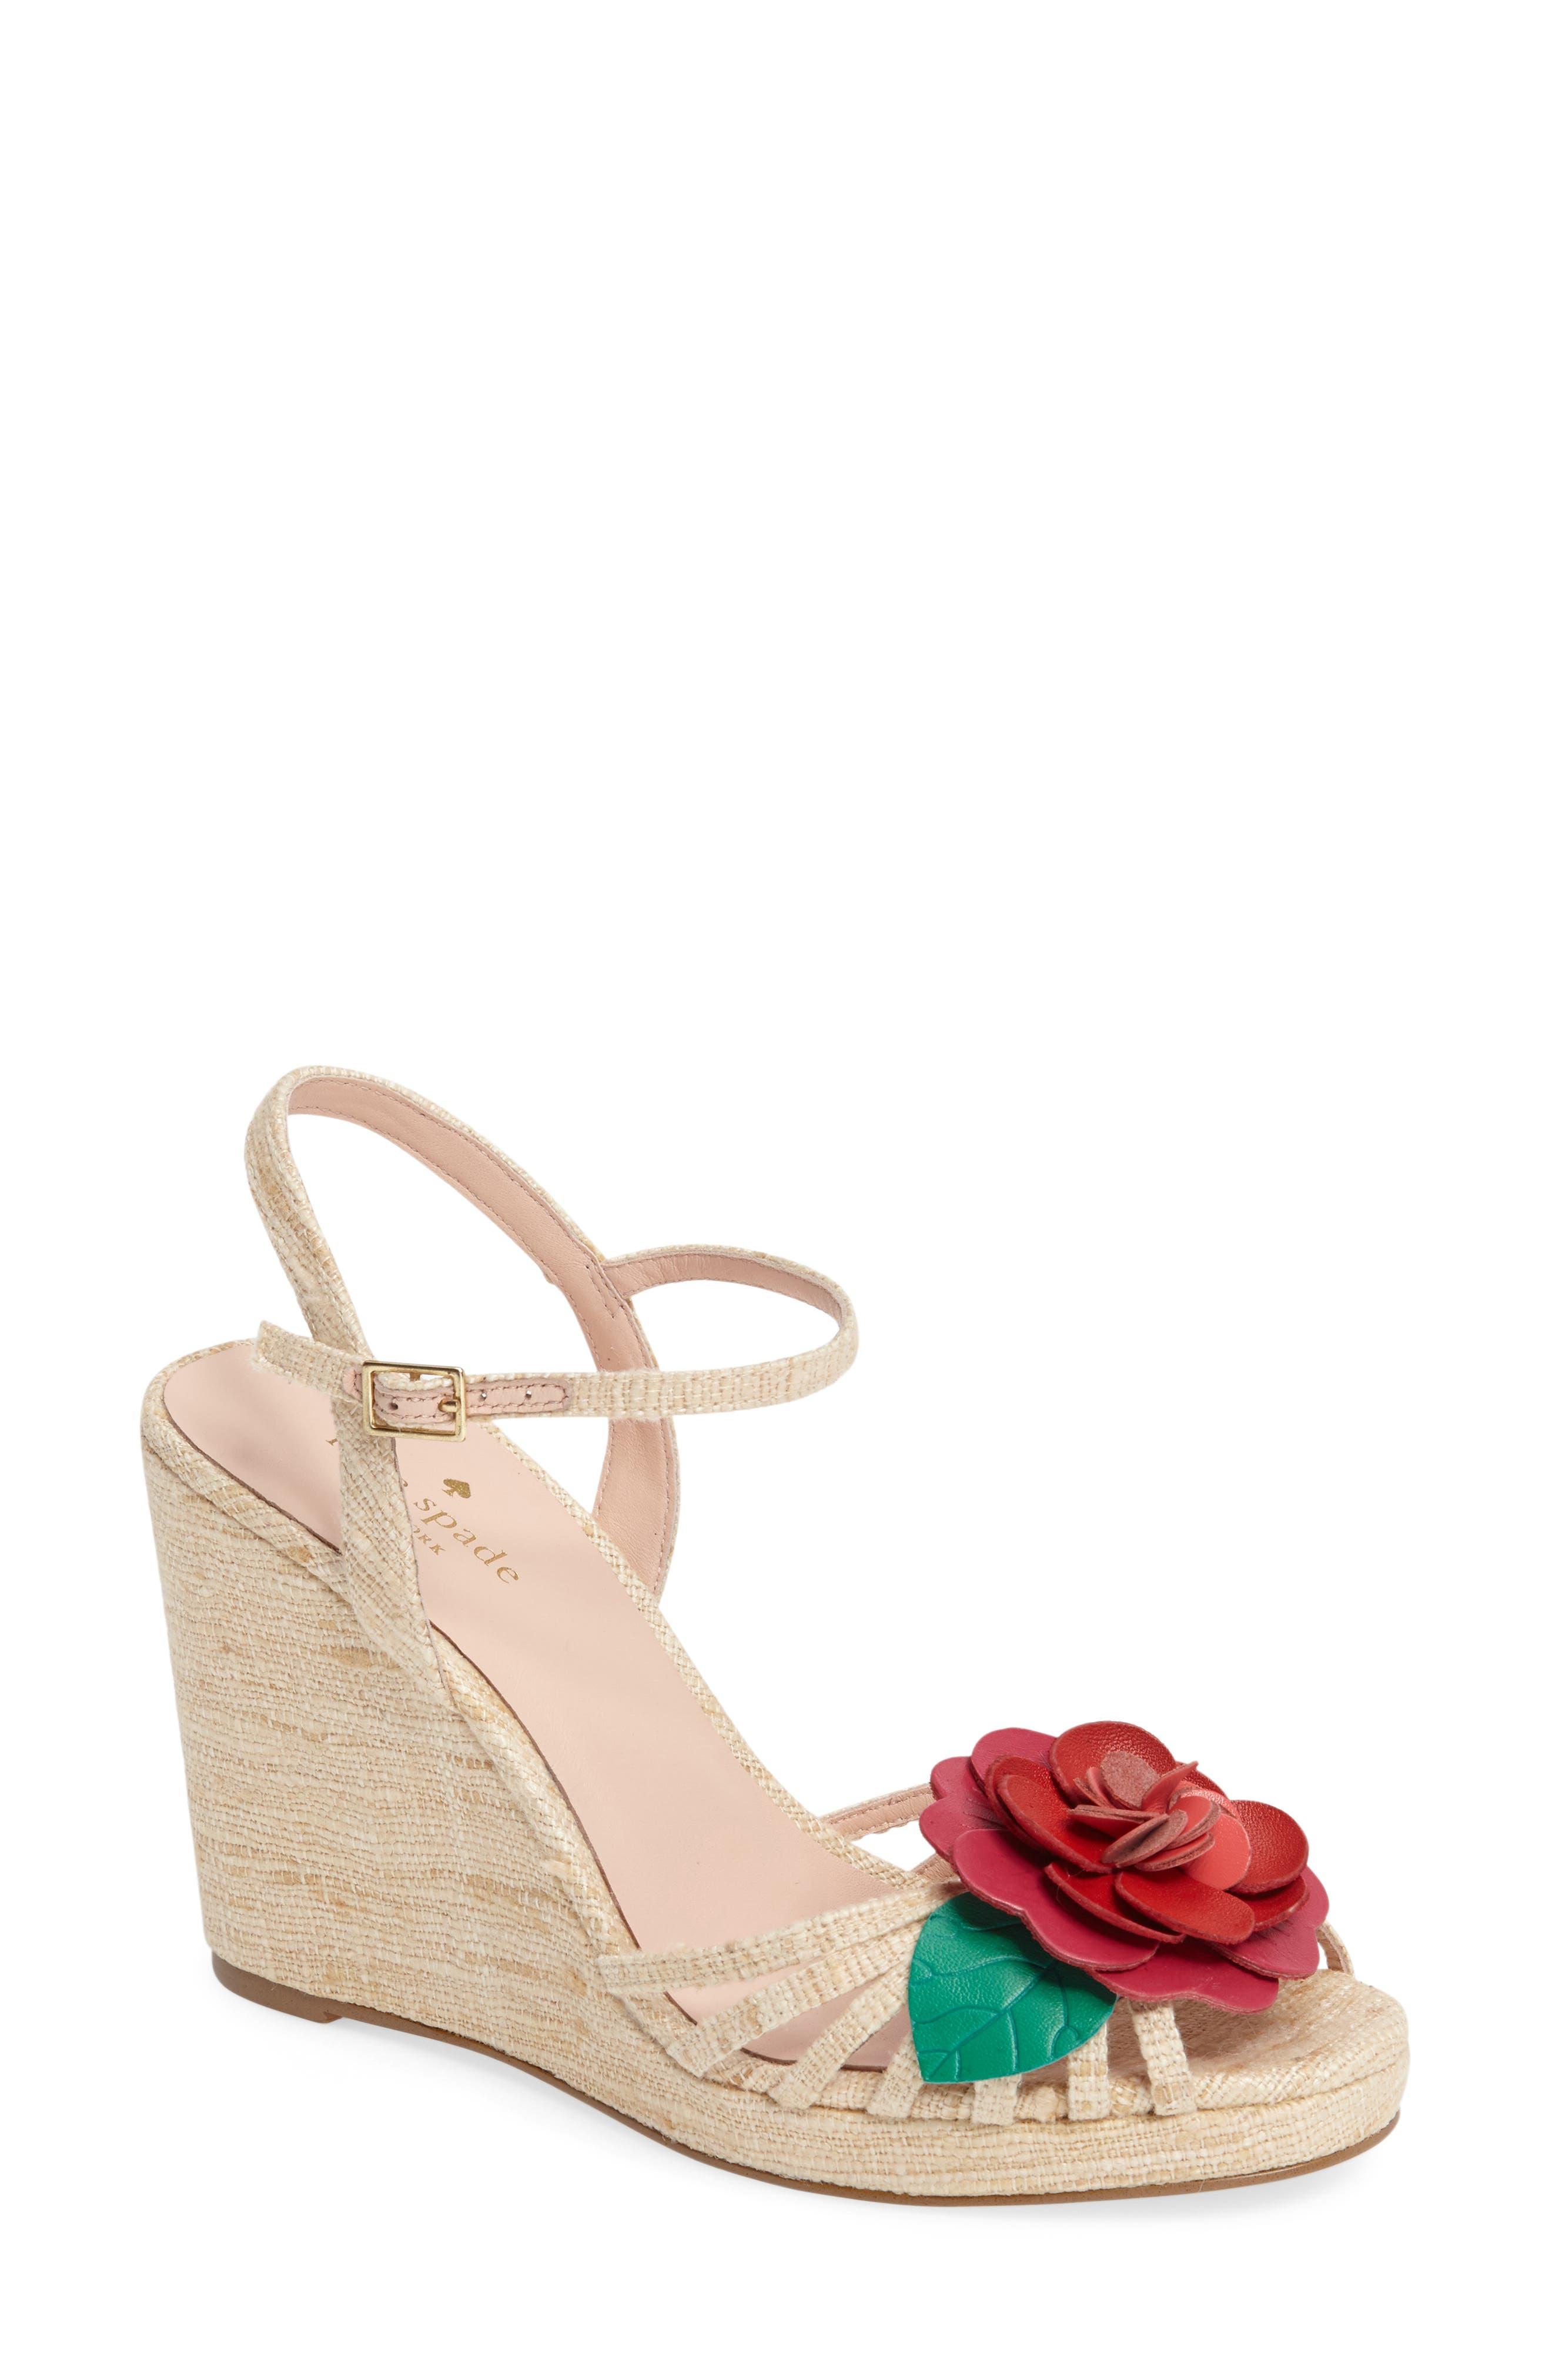 Alternate Image 1 Selected - kate spade new york beekman strappy wedge sandal (Women)